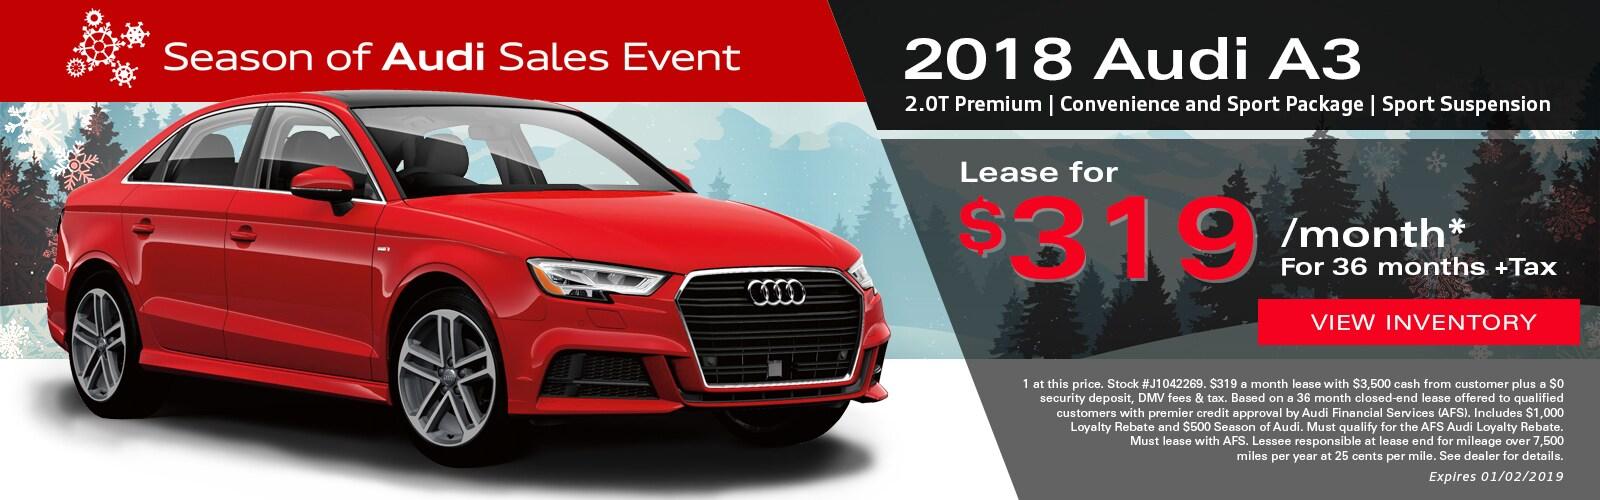 Audi Lease Specials Audi Finance Audi Palo Alto Serving San